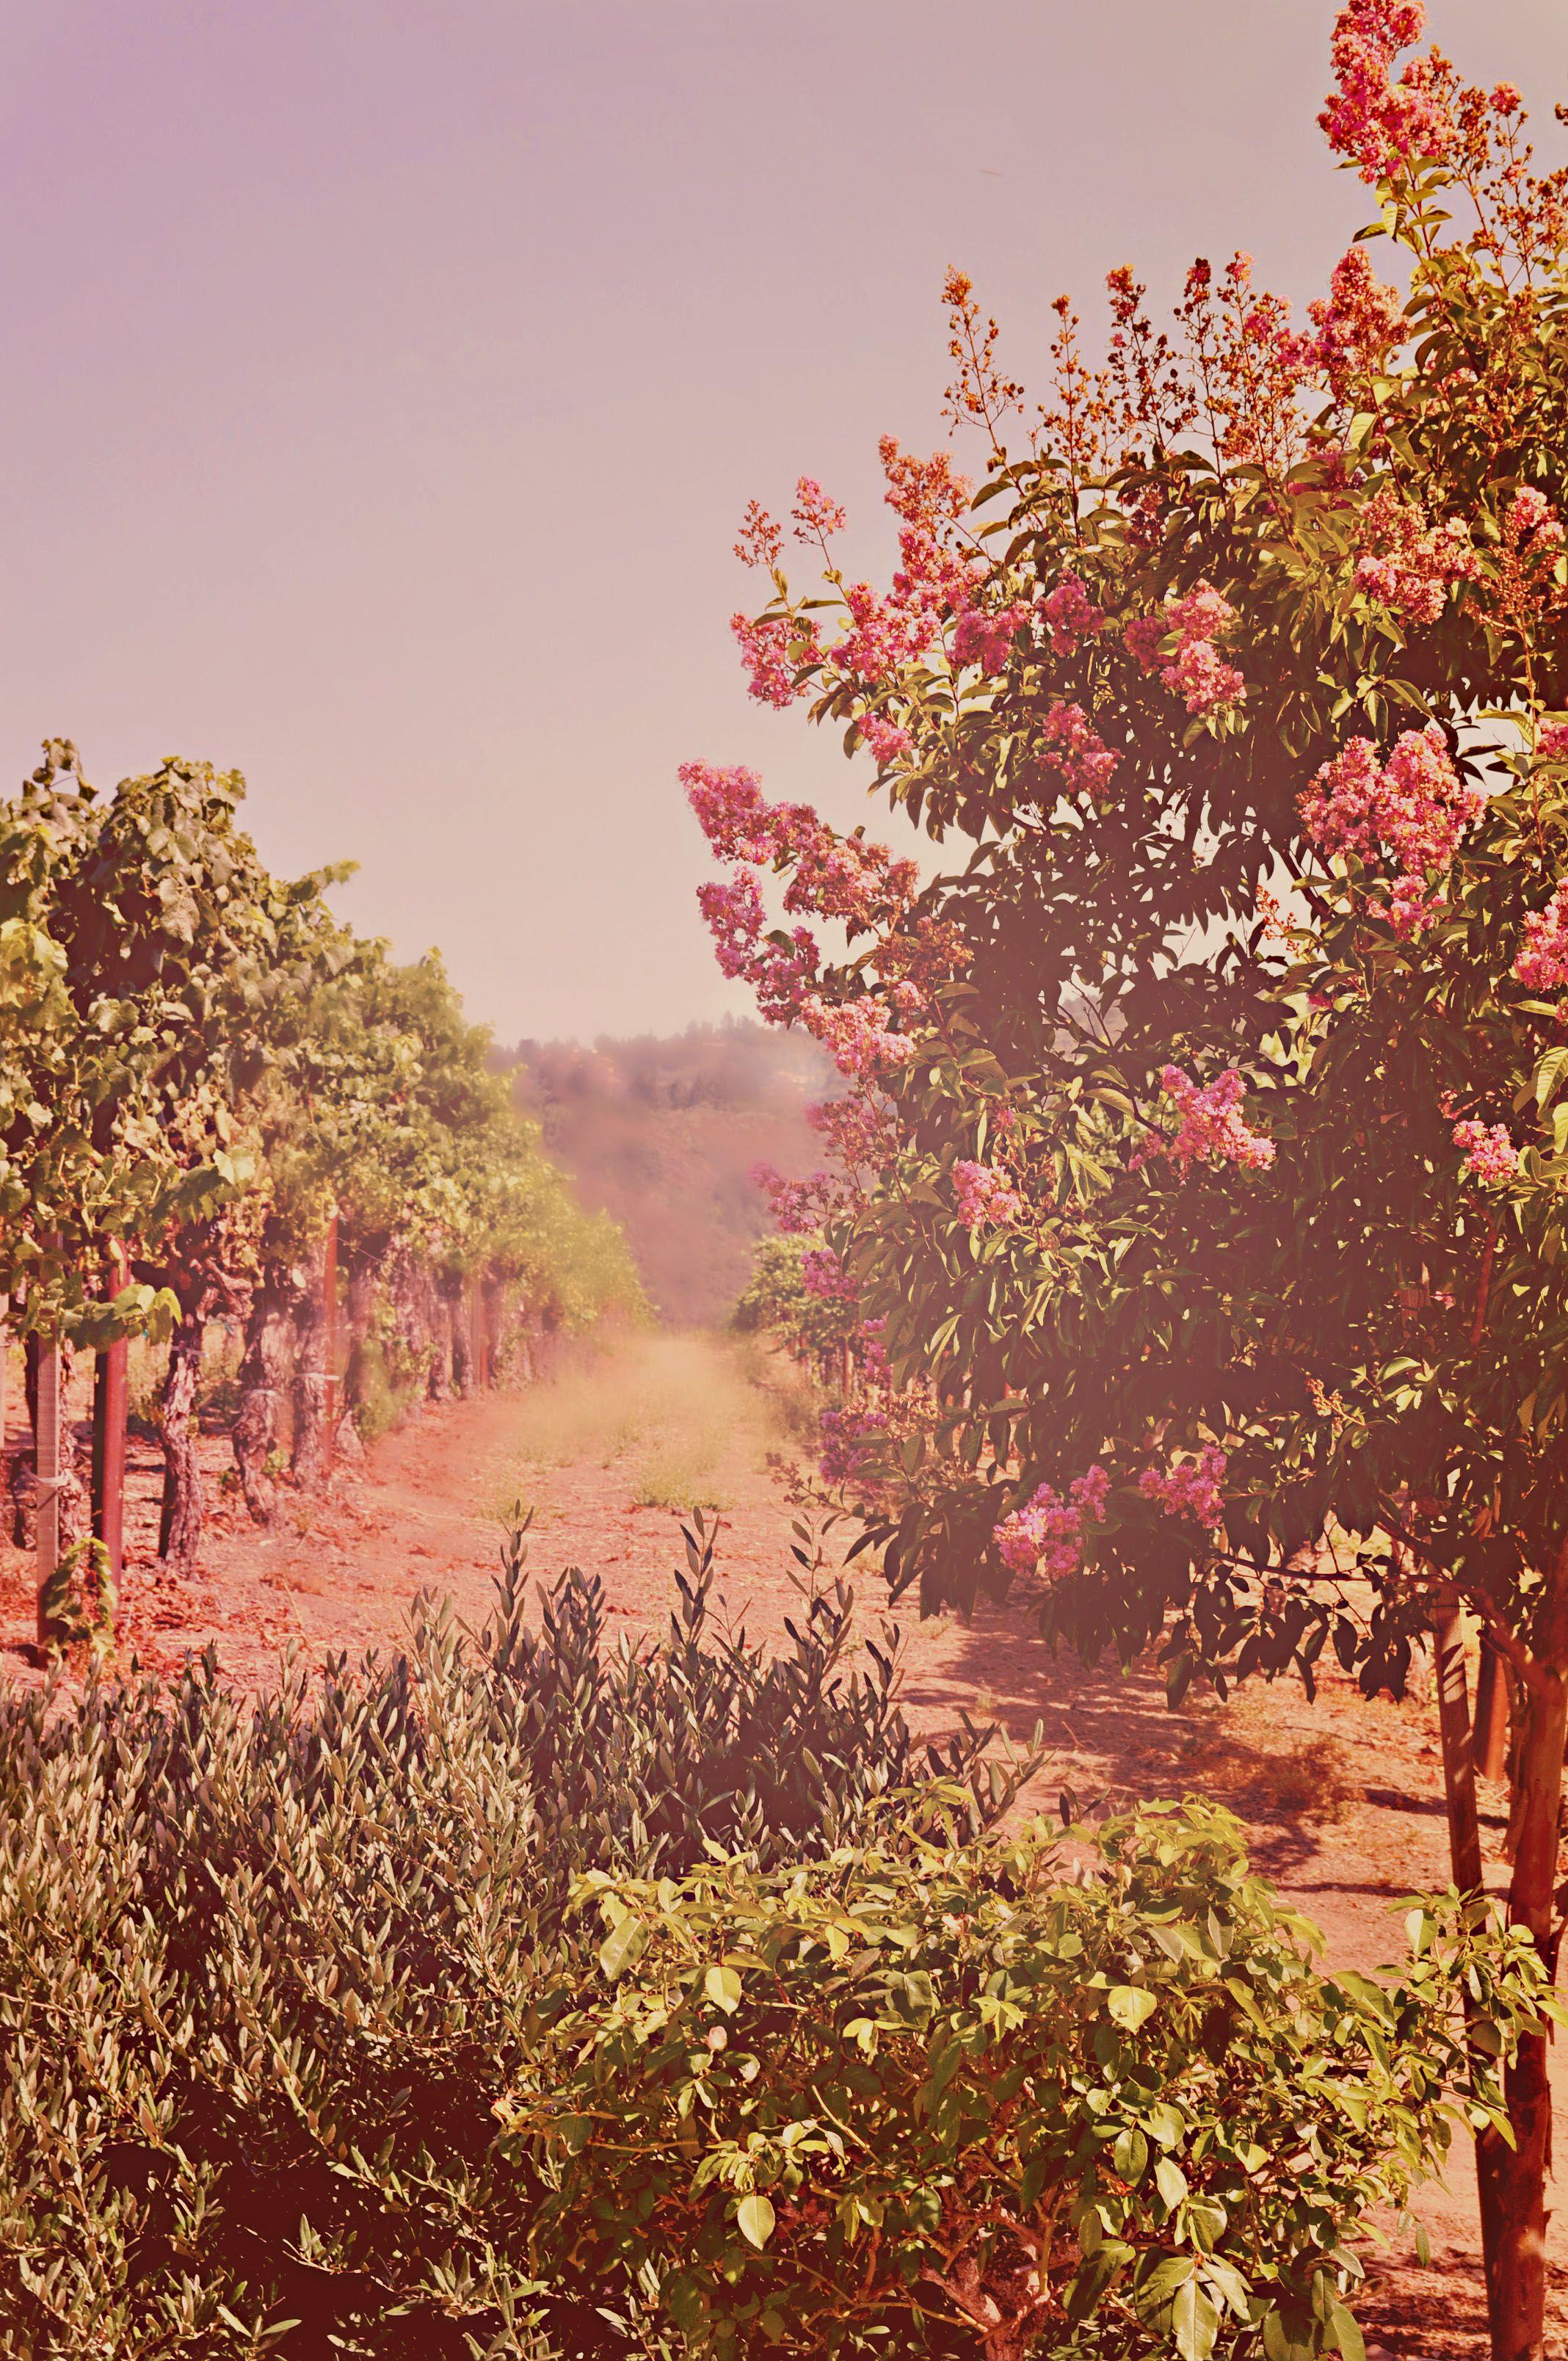 Savannah-Chanelle Vineyards in Santa Cruz Mountains